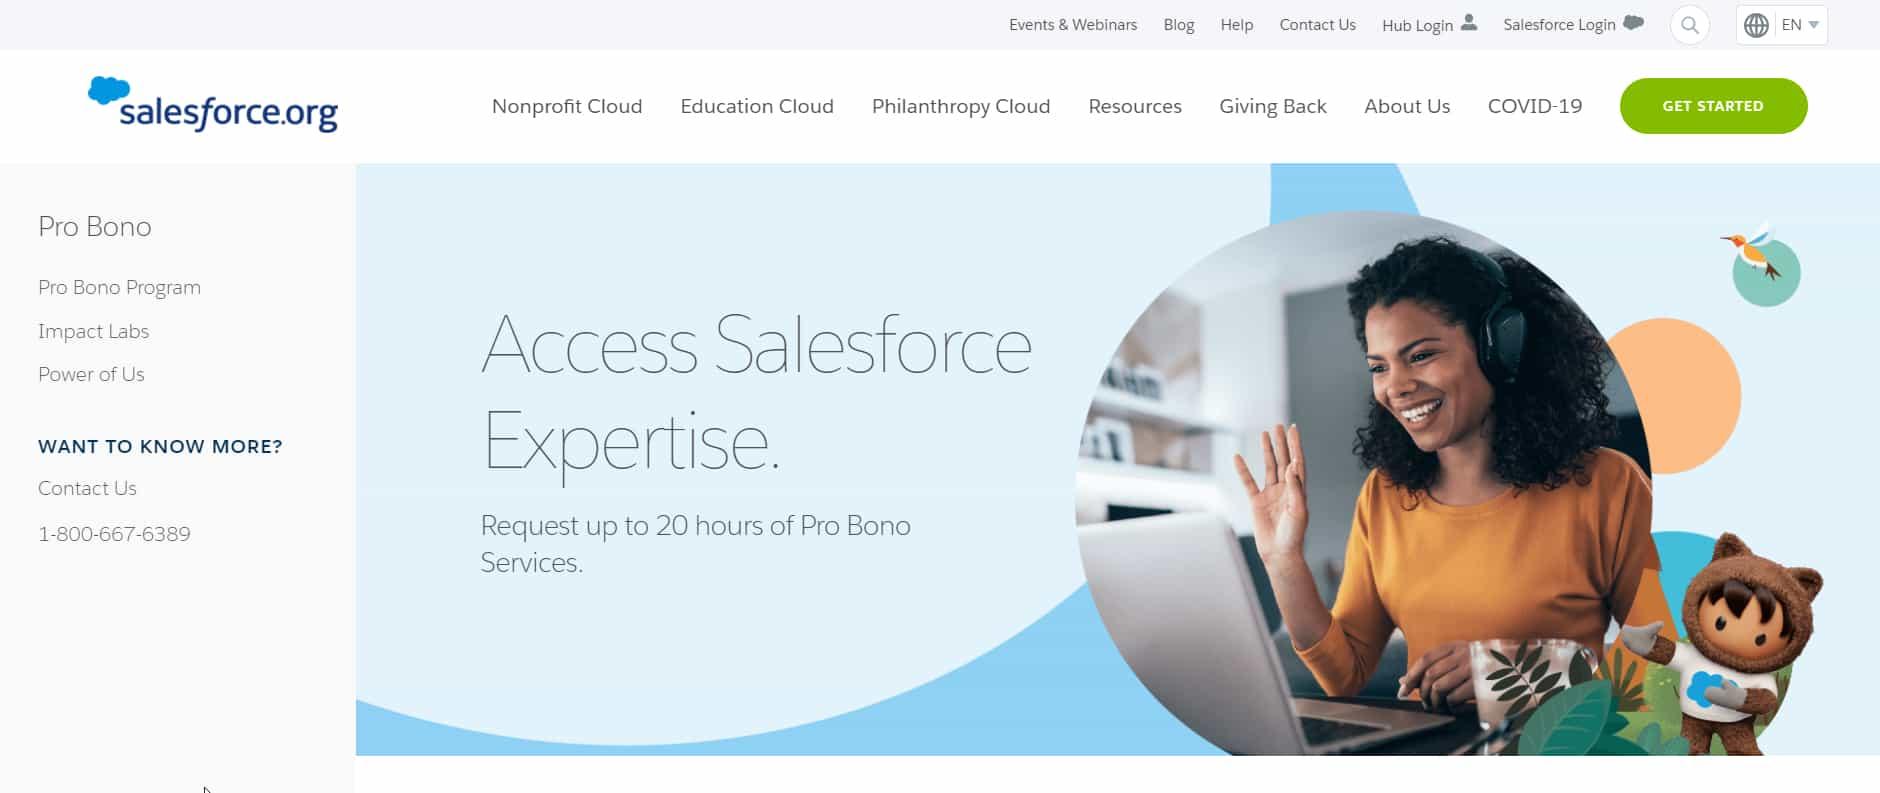 Salesforce Pro Bono Program for Nonprofit and Education Clouds